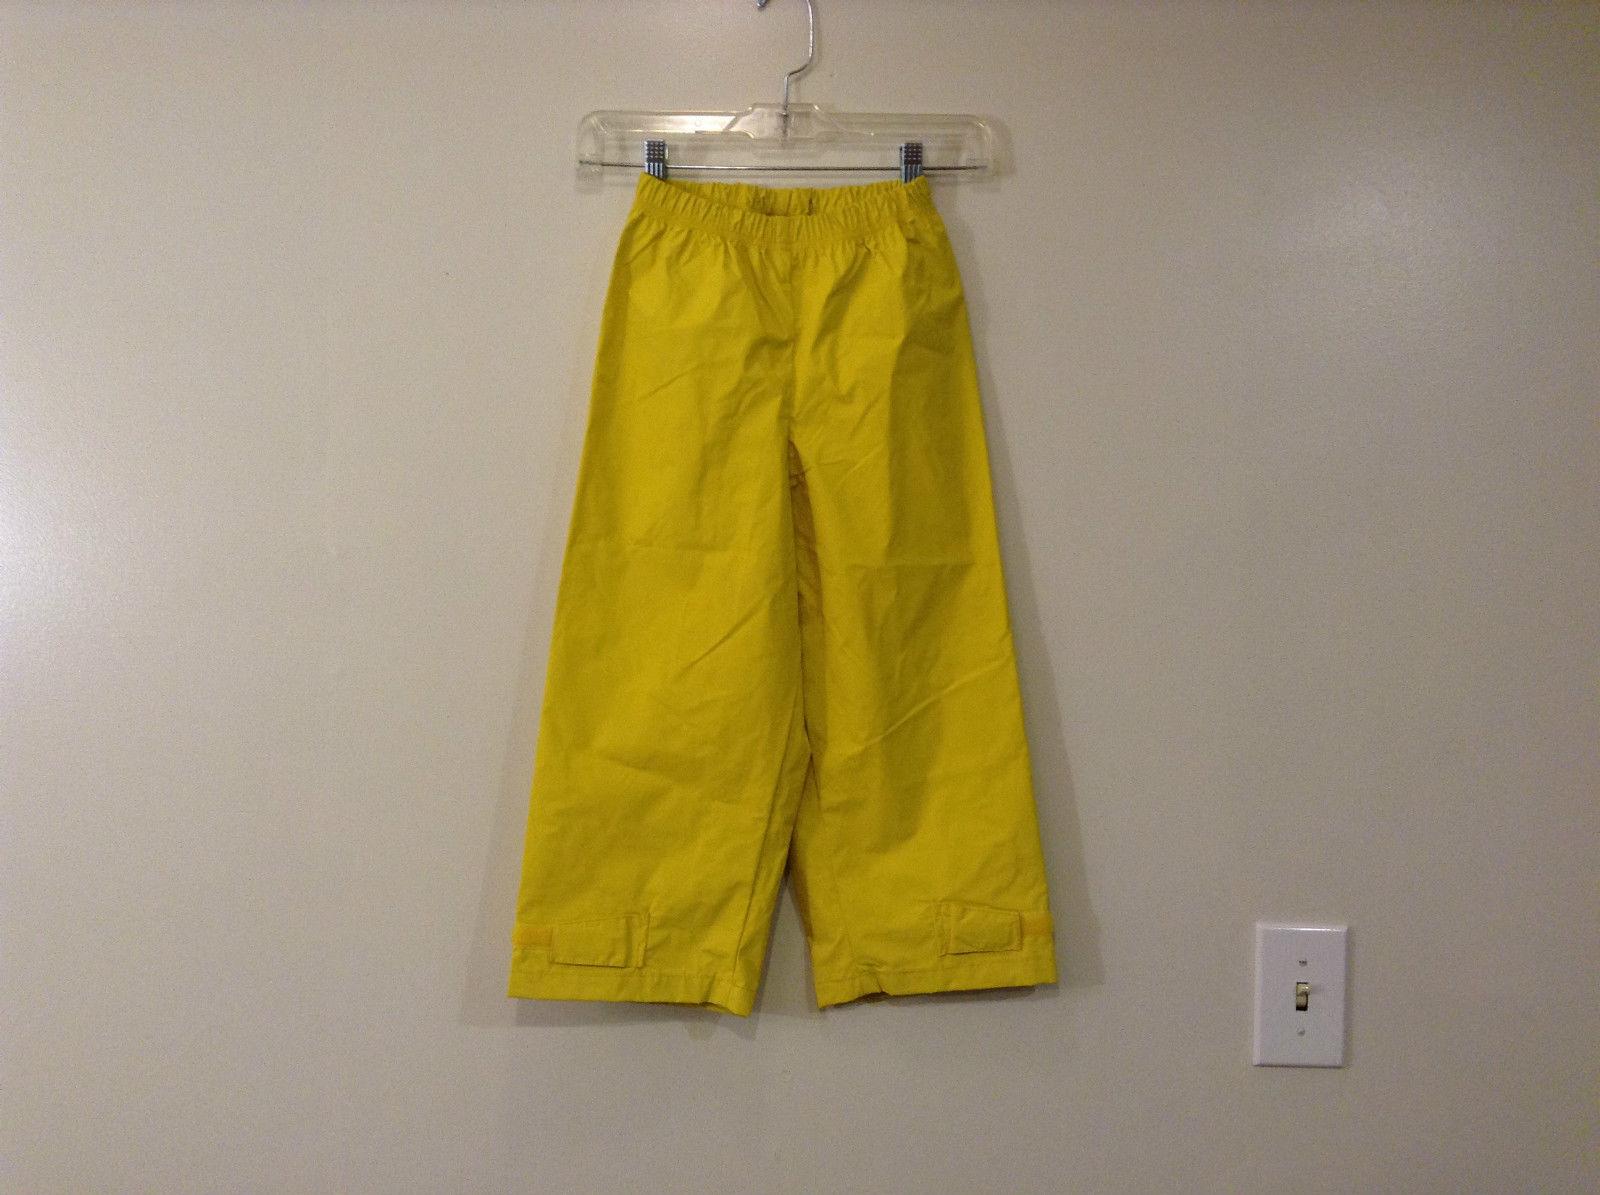 Bright Yellow L L Bean Kids Elastic Waist Pants Size XS 6 Adjustable Leg Width